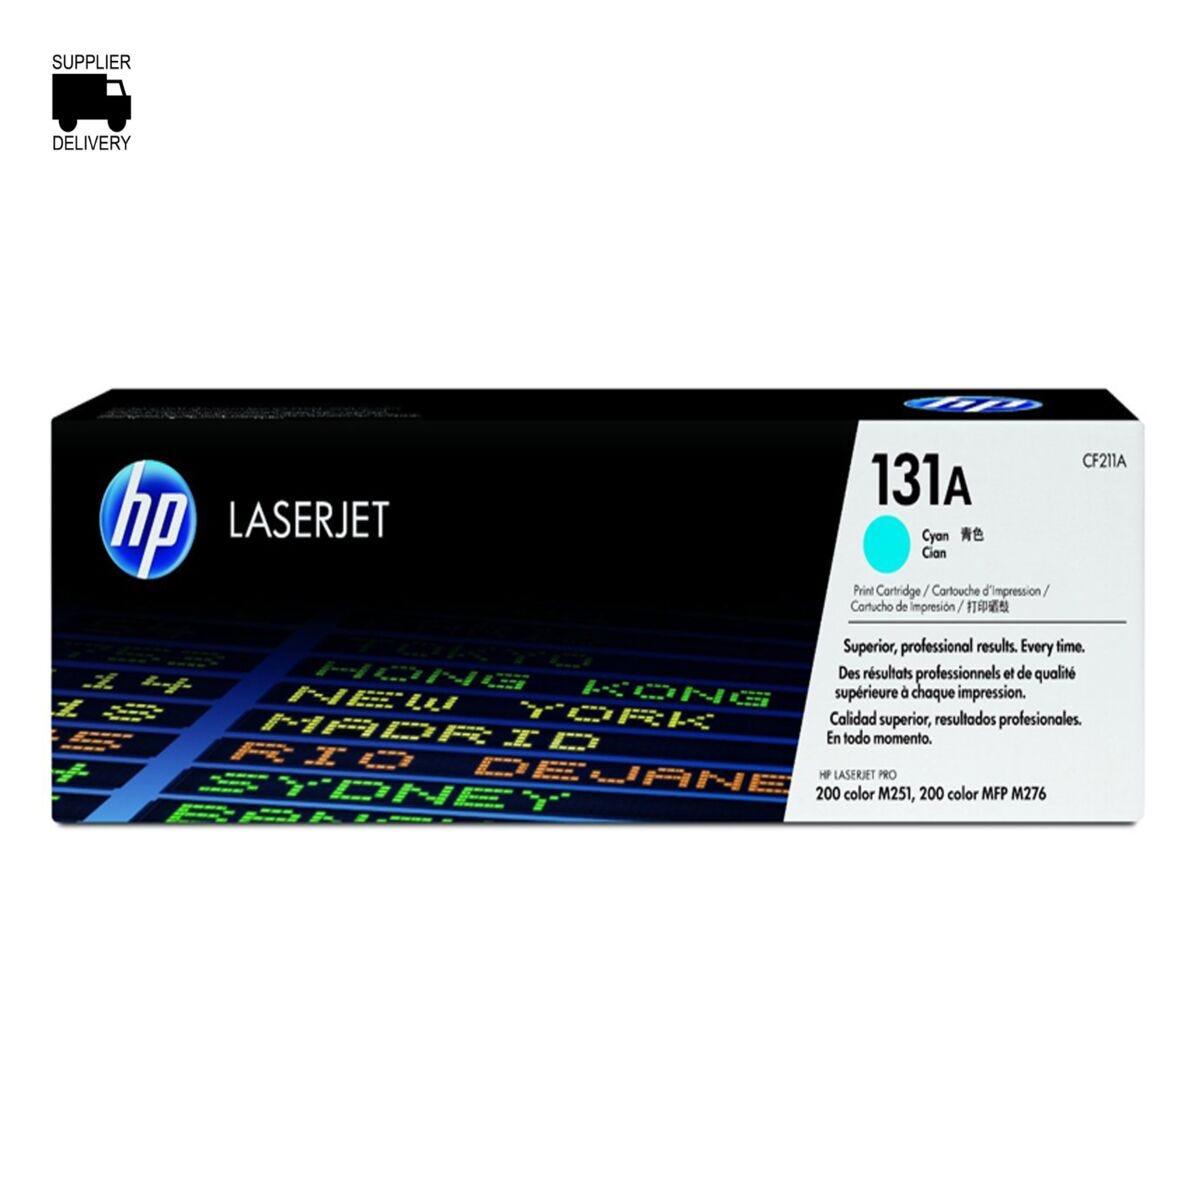 HP 131A Laserjet Toner Cartridge CF211A